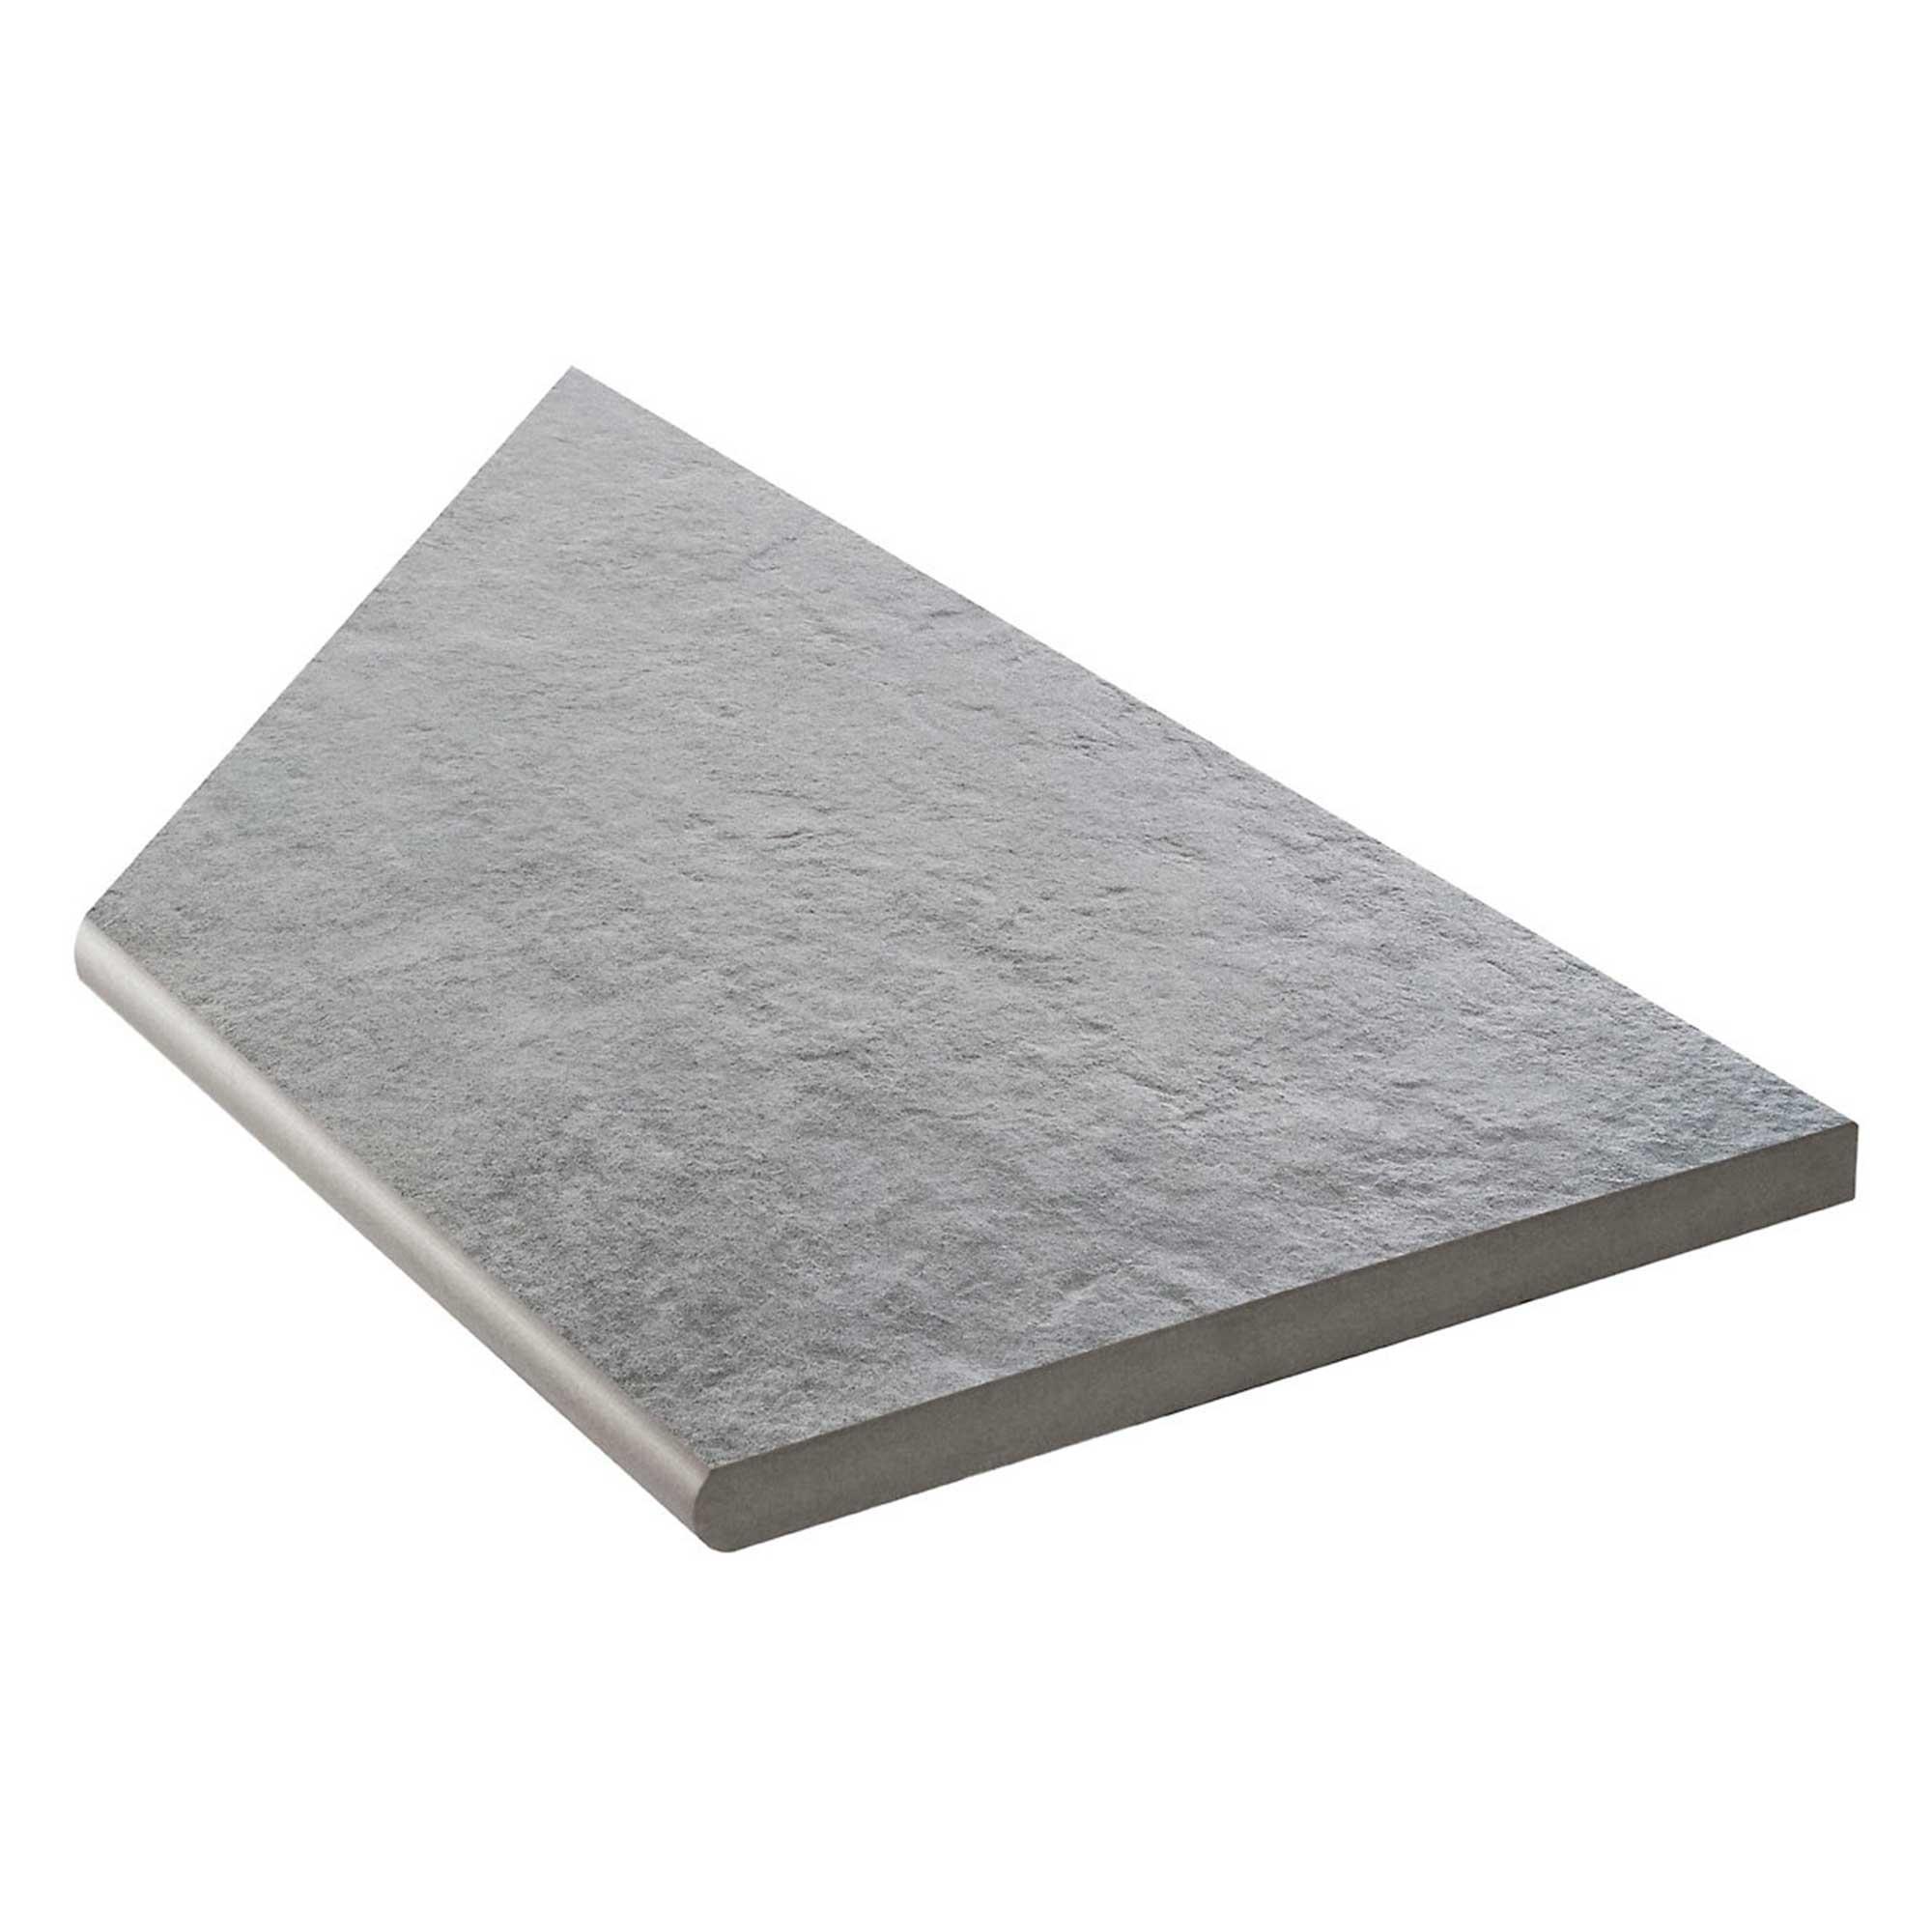 Klinker Bricmate Z Concrete Anthracite Inner Corner Right 30x60 cm